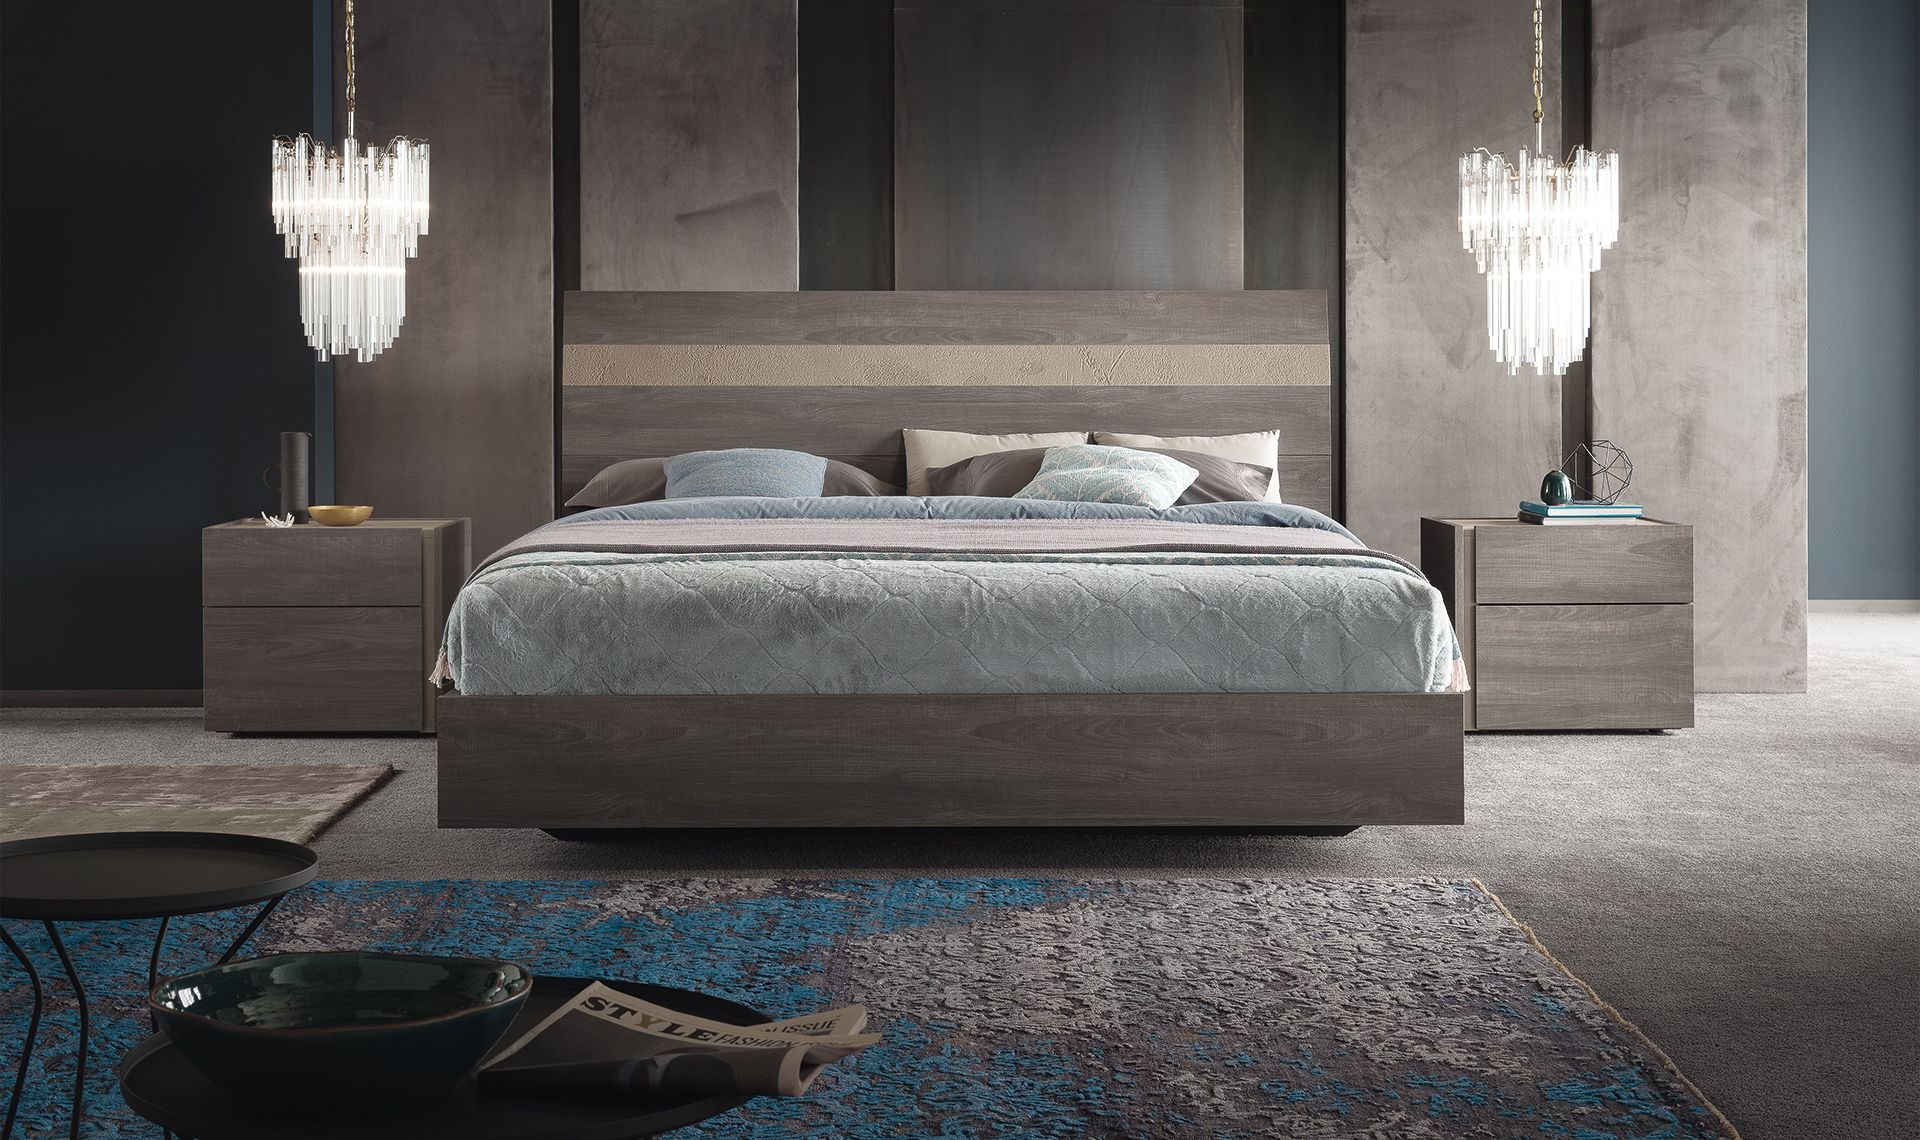 Nizza Bedroom Set By Alf Home Decor Italian Interior Design